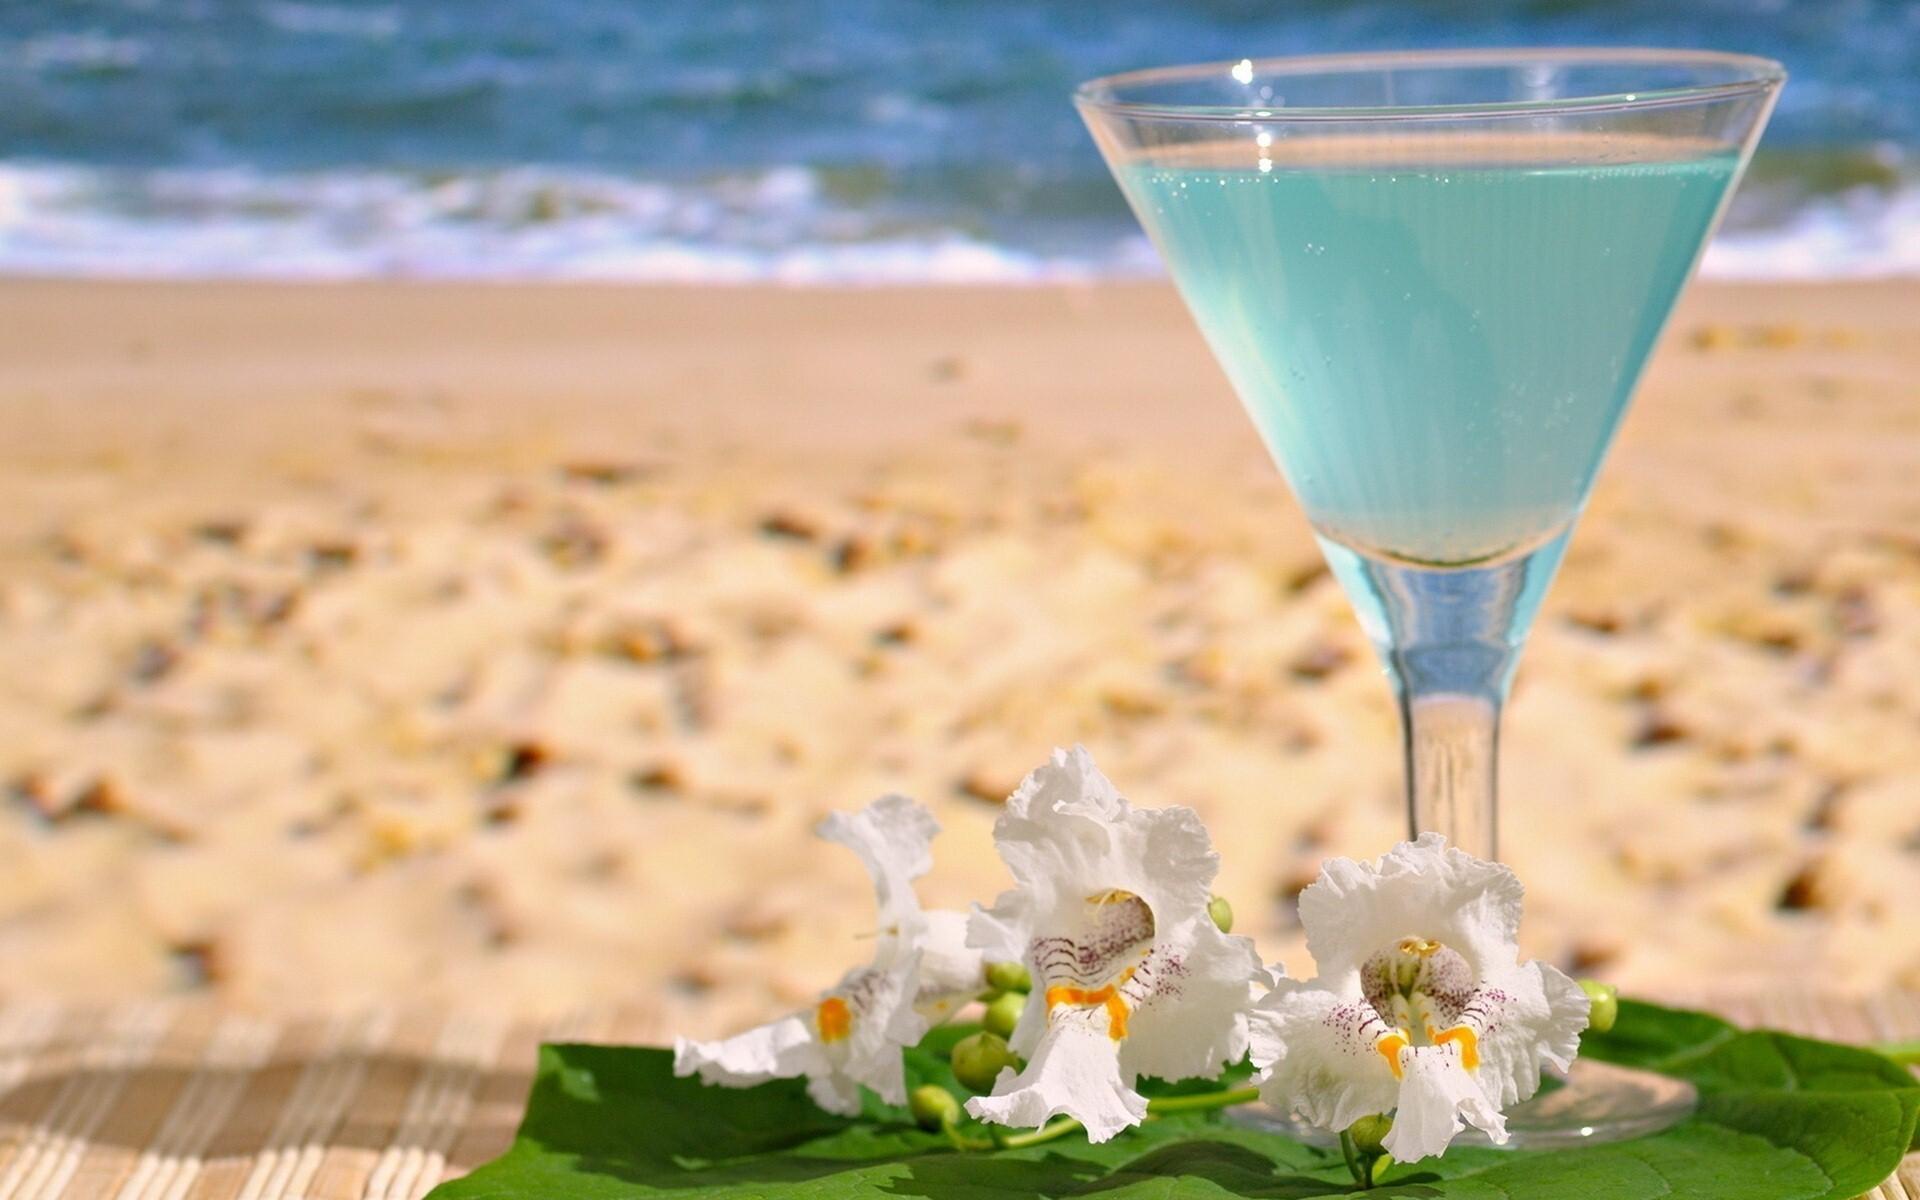 Summer Wallpapers Previous Wallpaper Drink On Beach